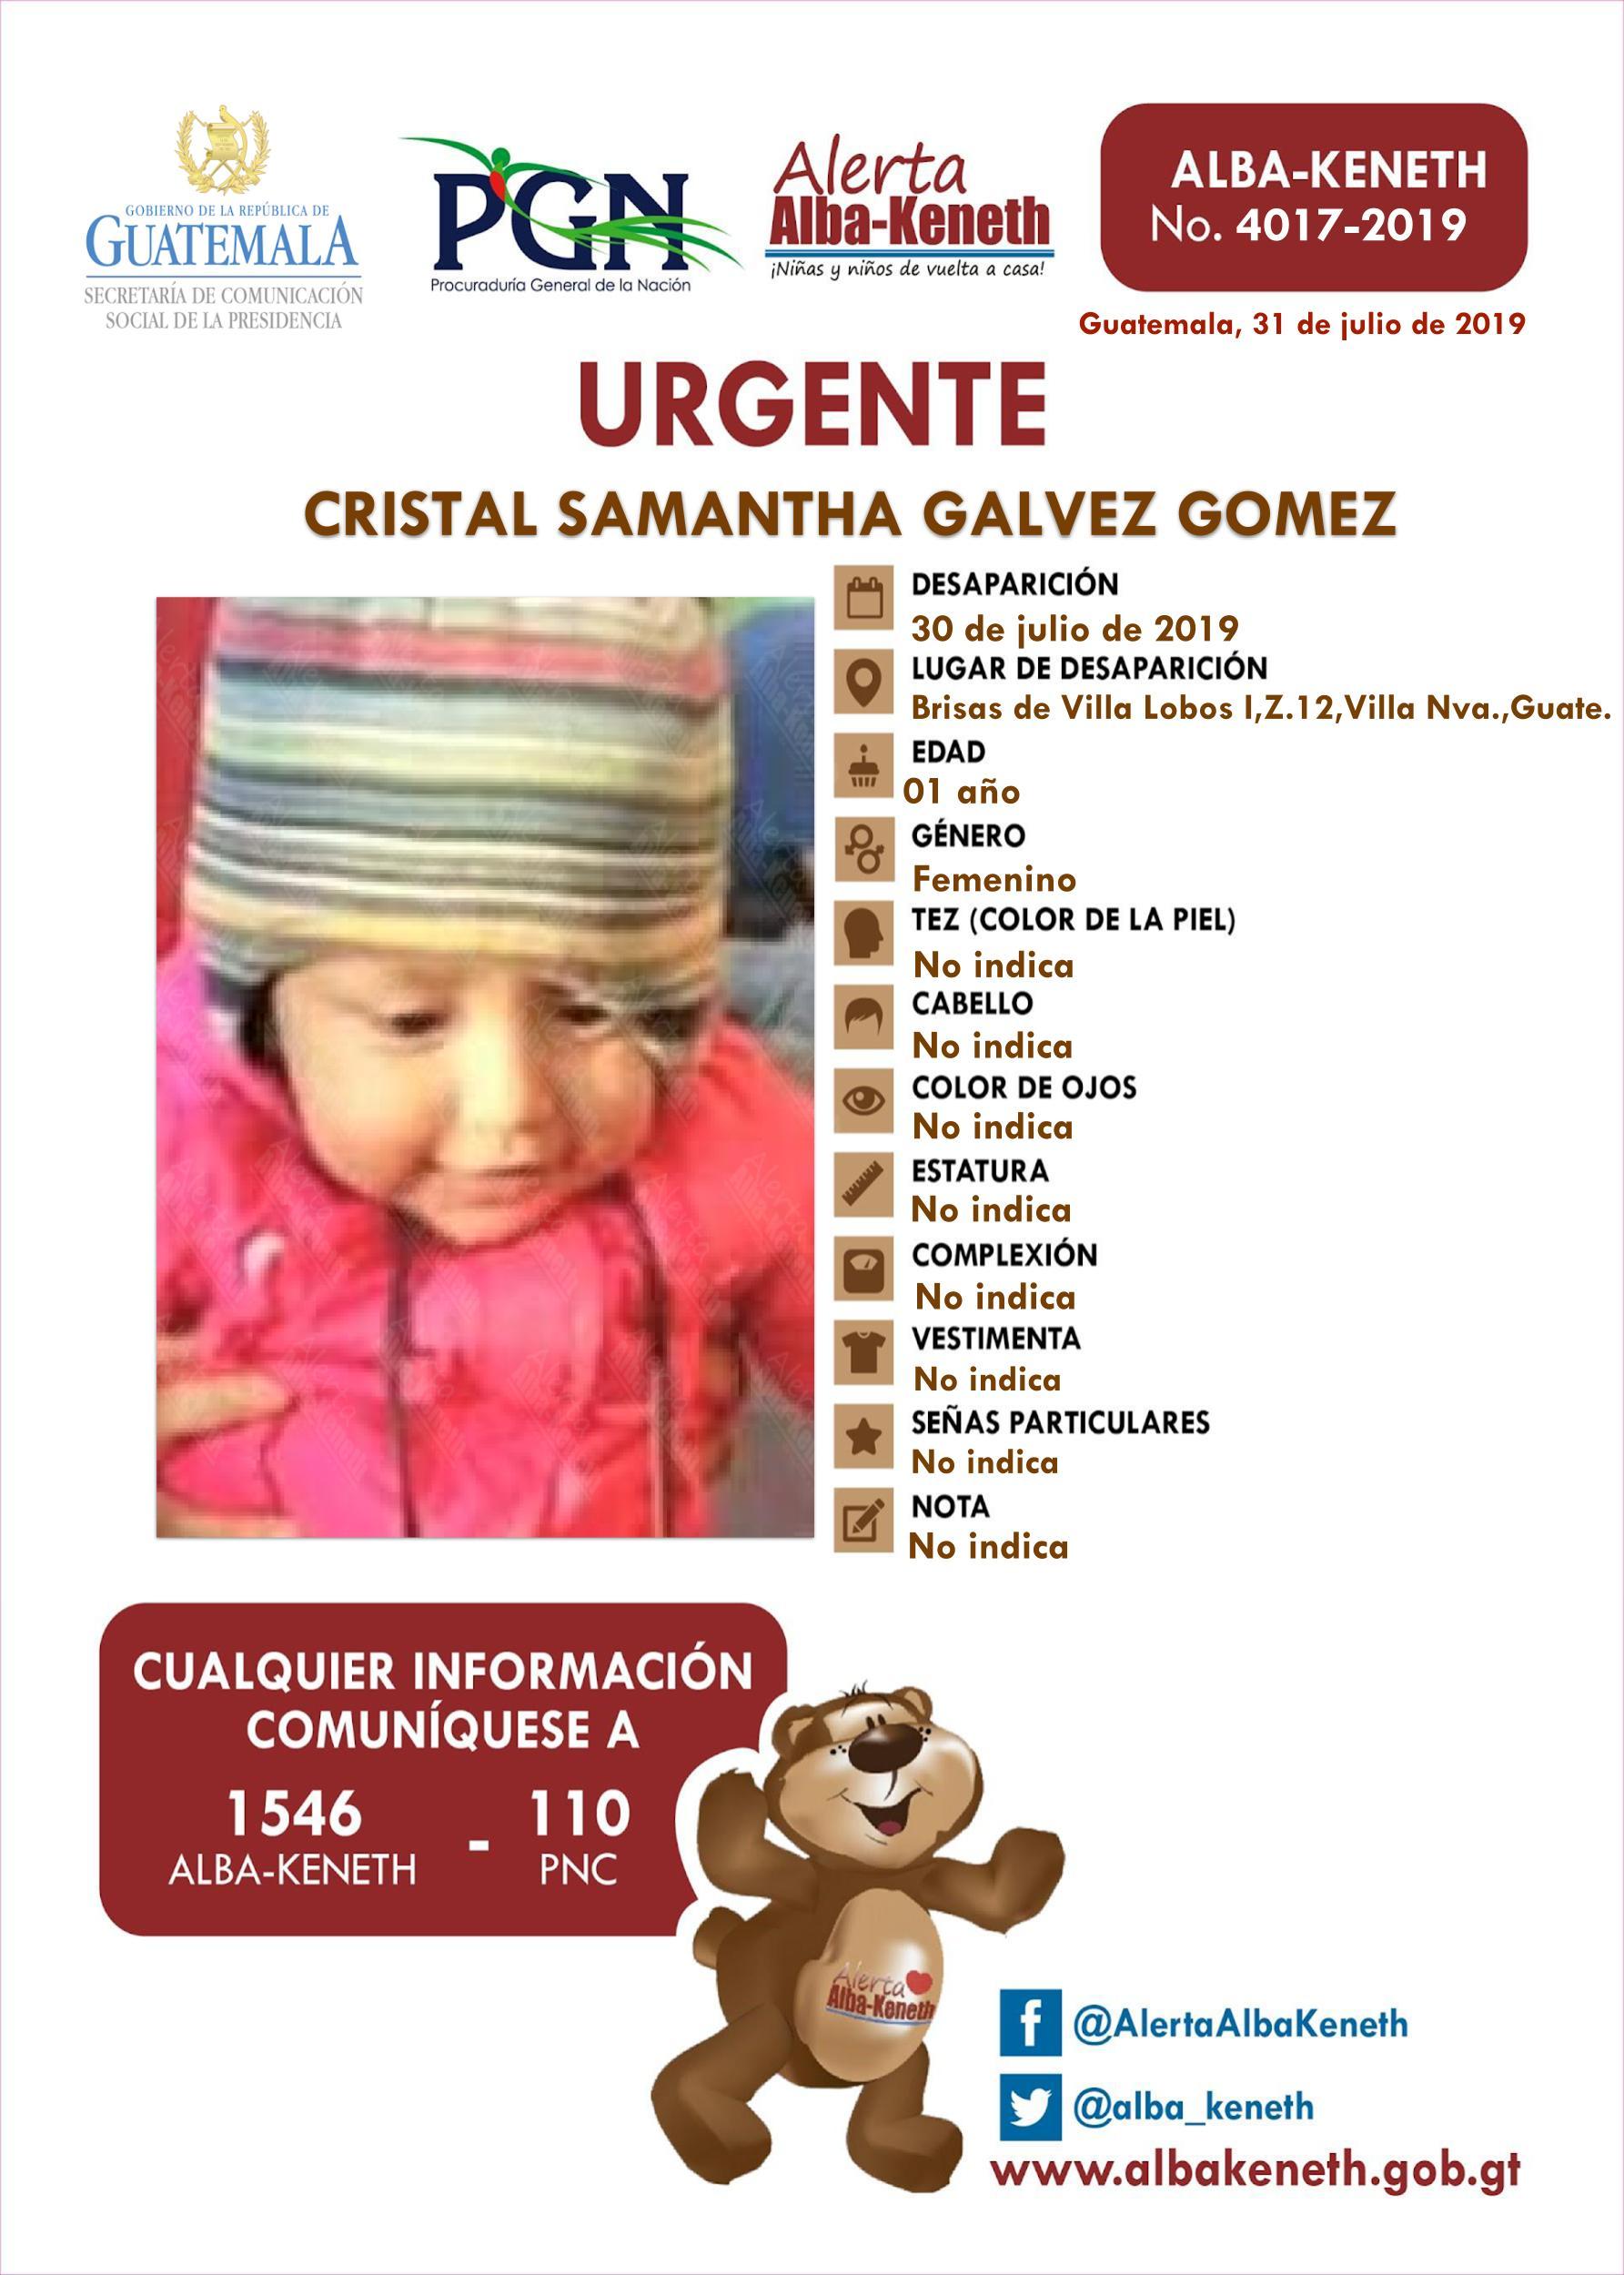 Cristal Samantha Galvez Gomez